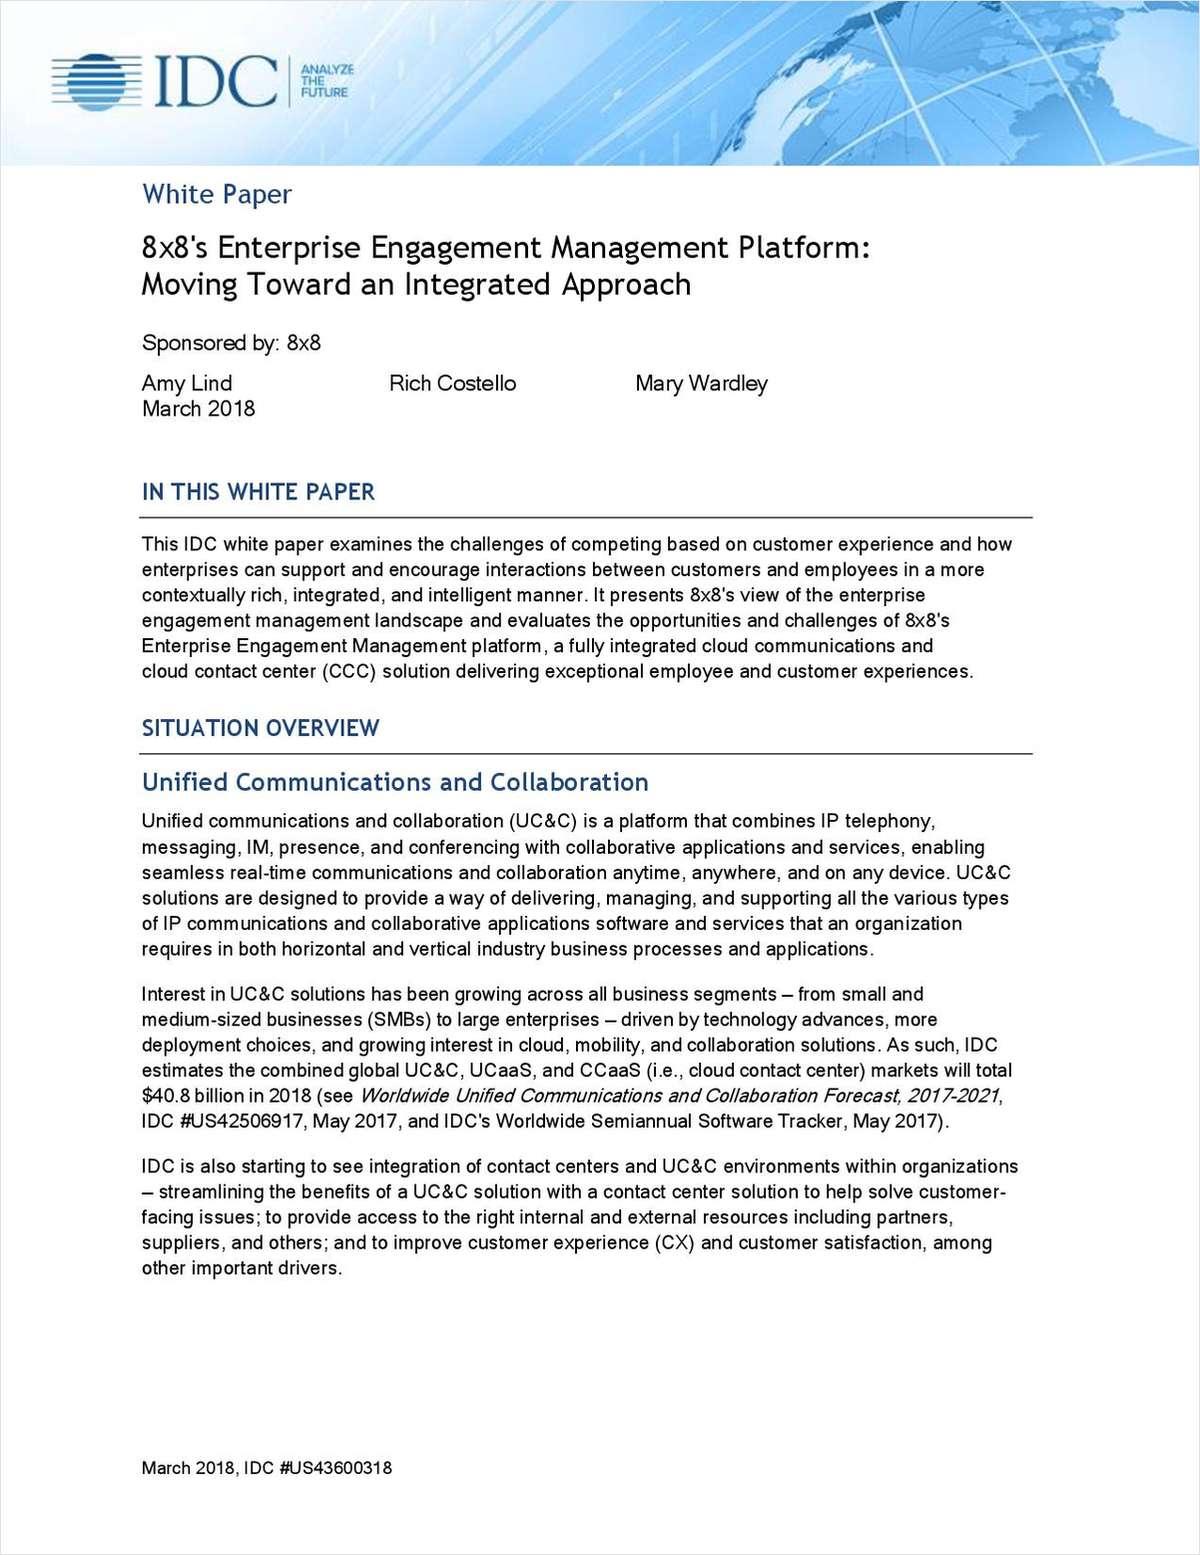 8x8's Enterprise Engagement Management Platform: Moving Toward an Integrated Approach